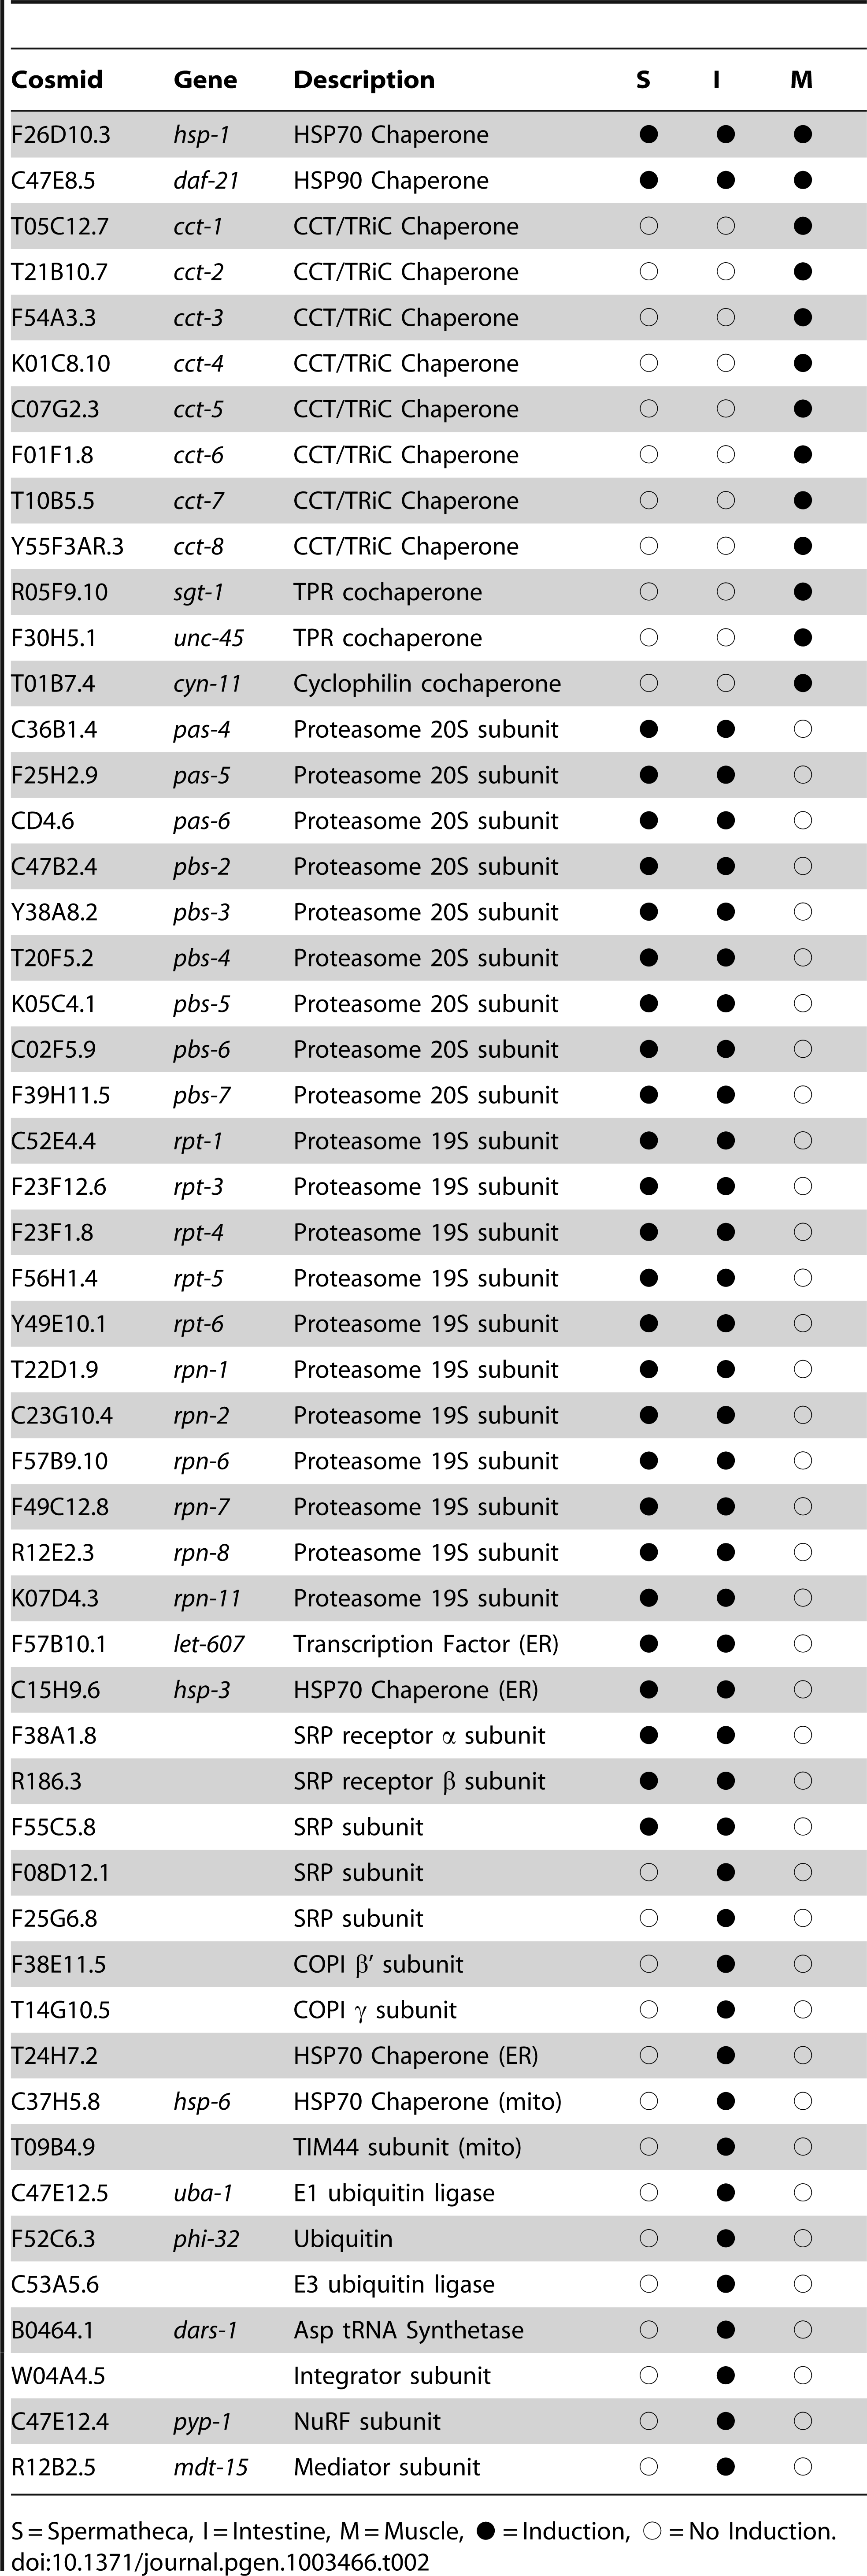 Negative regulators of the HSR and <i>hsp70::gfp</i> reporter induction.